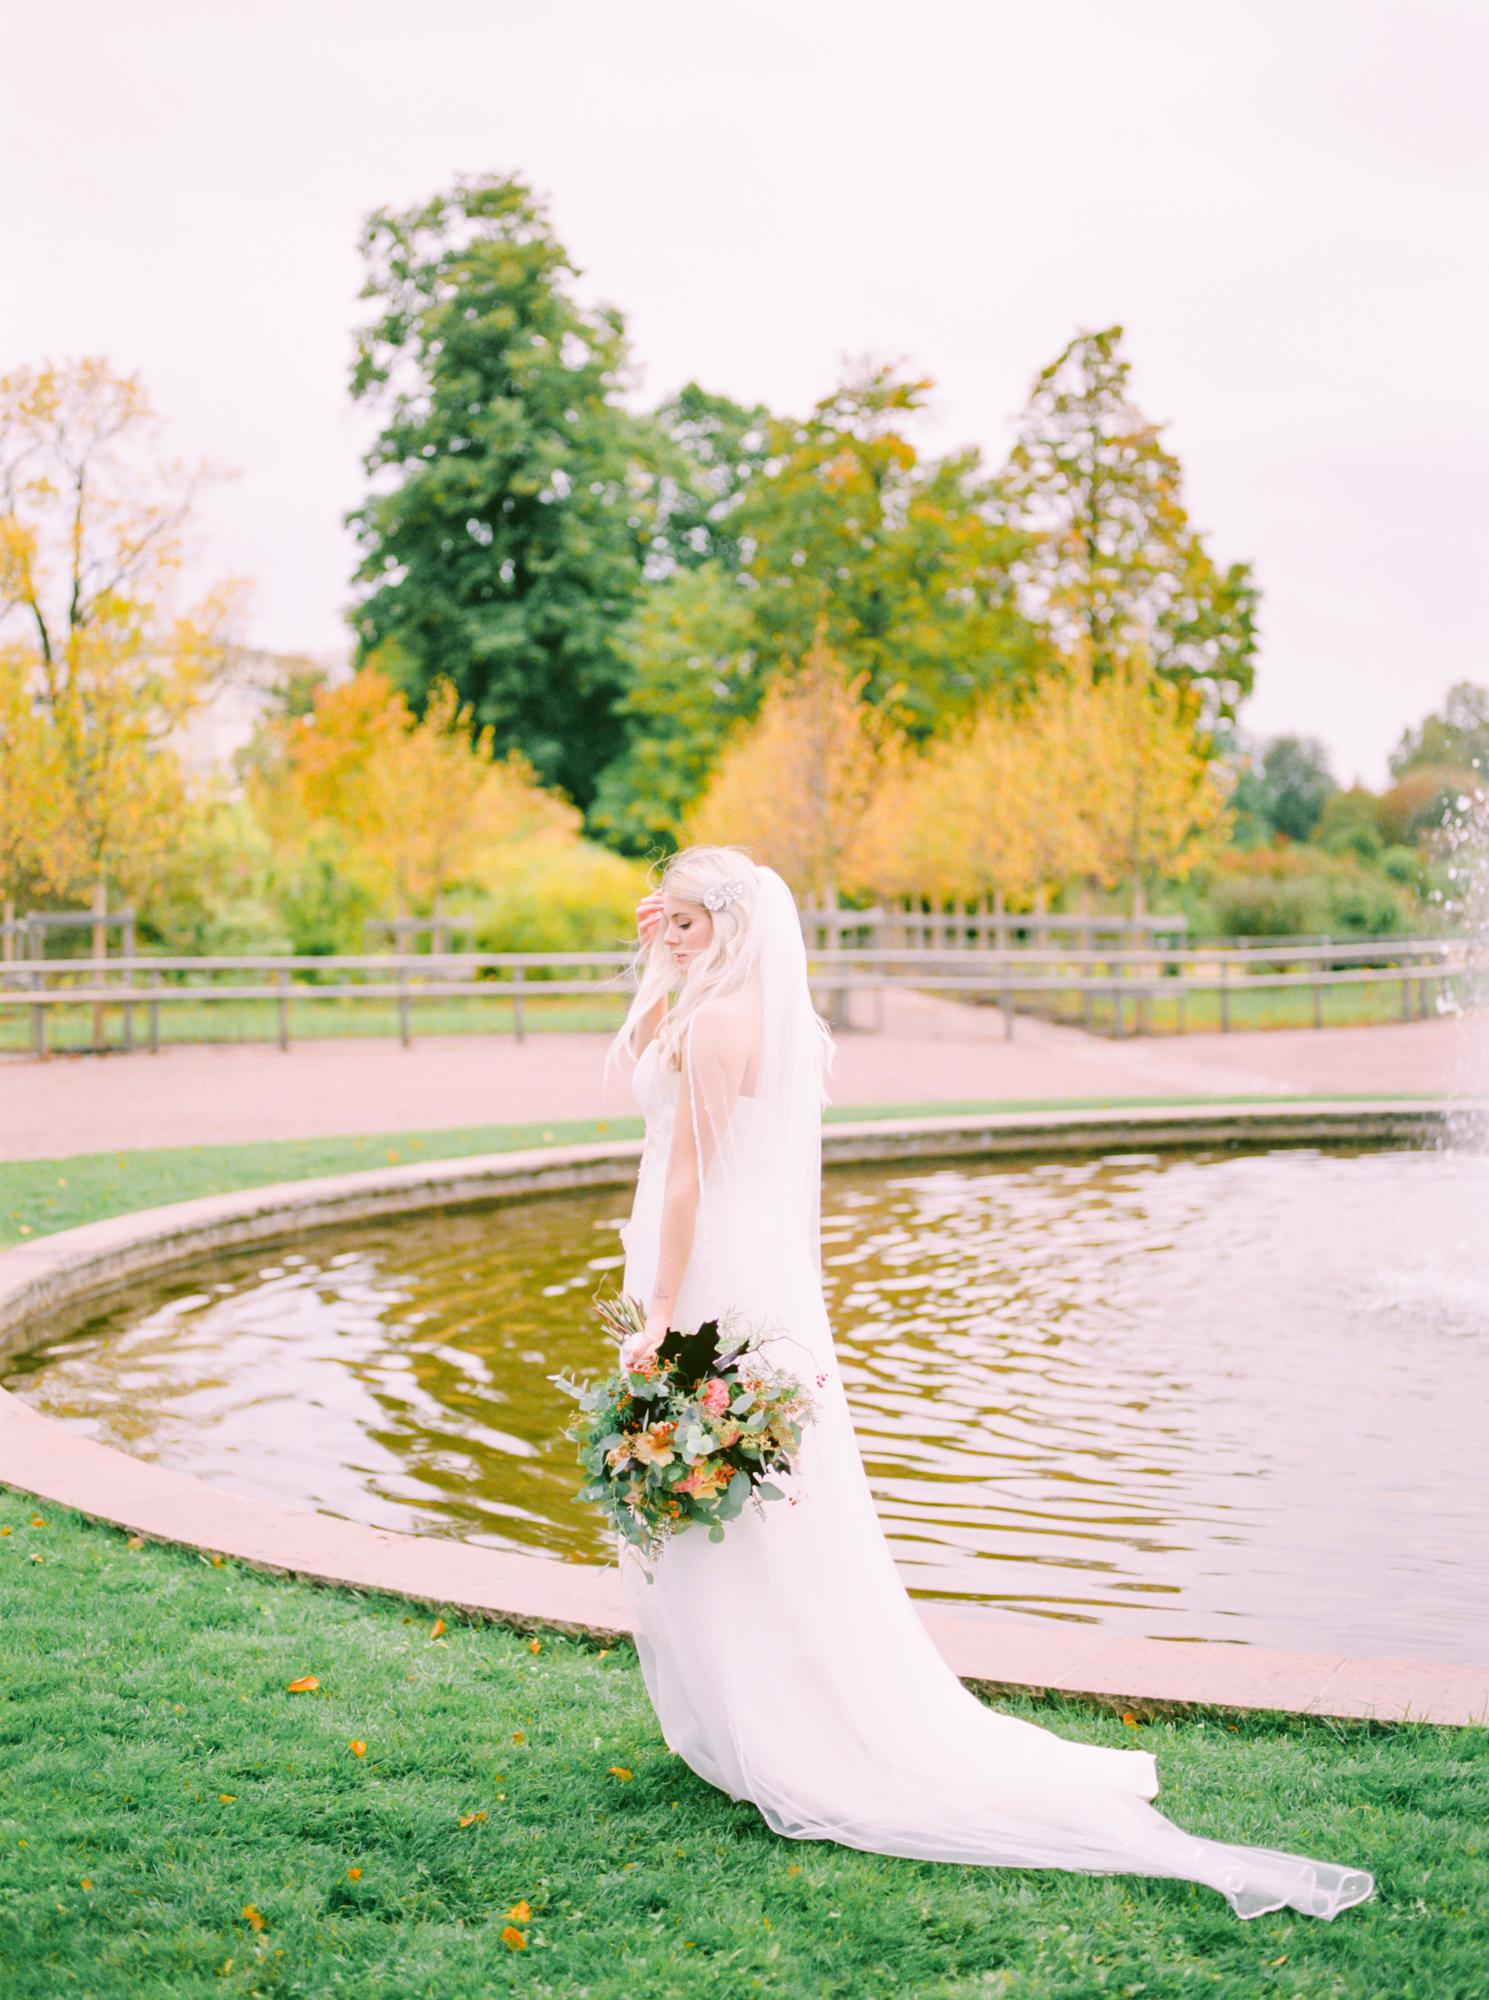 Elegant Organic Fall Swedish Bridal Wedding Styled Shoot - Erika Alvarenga Photography-89.jpg